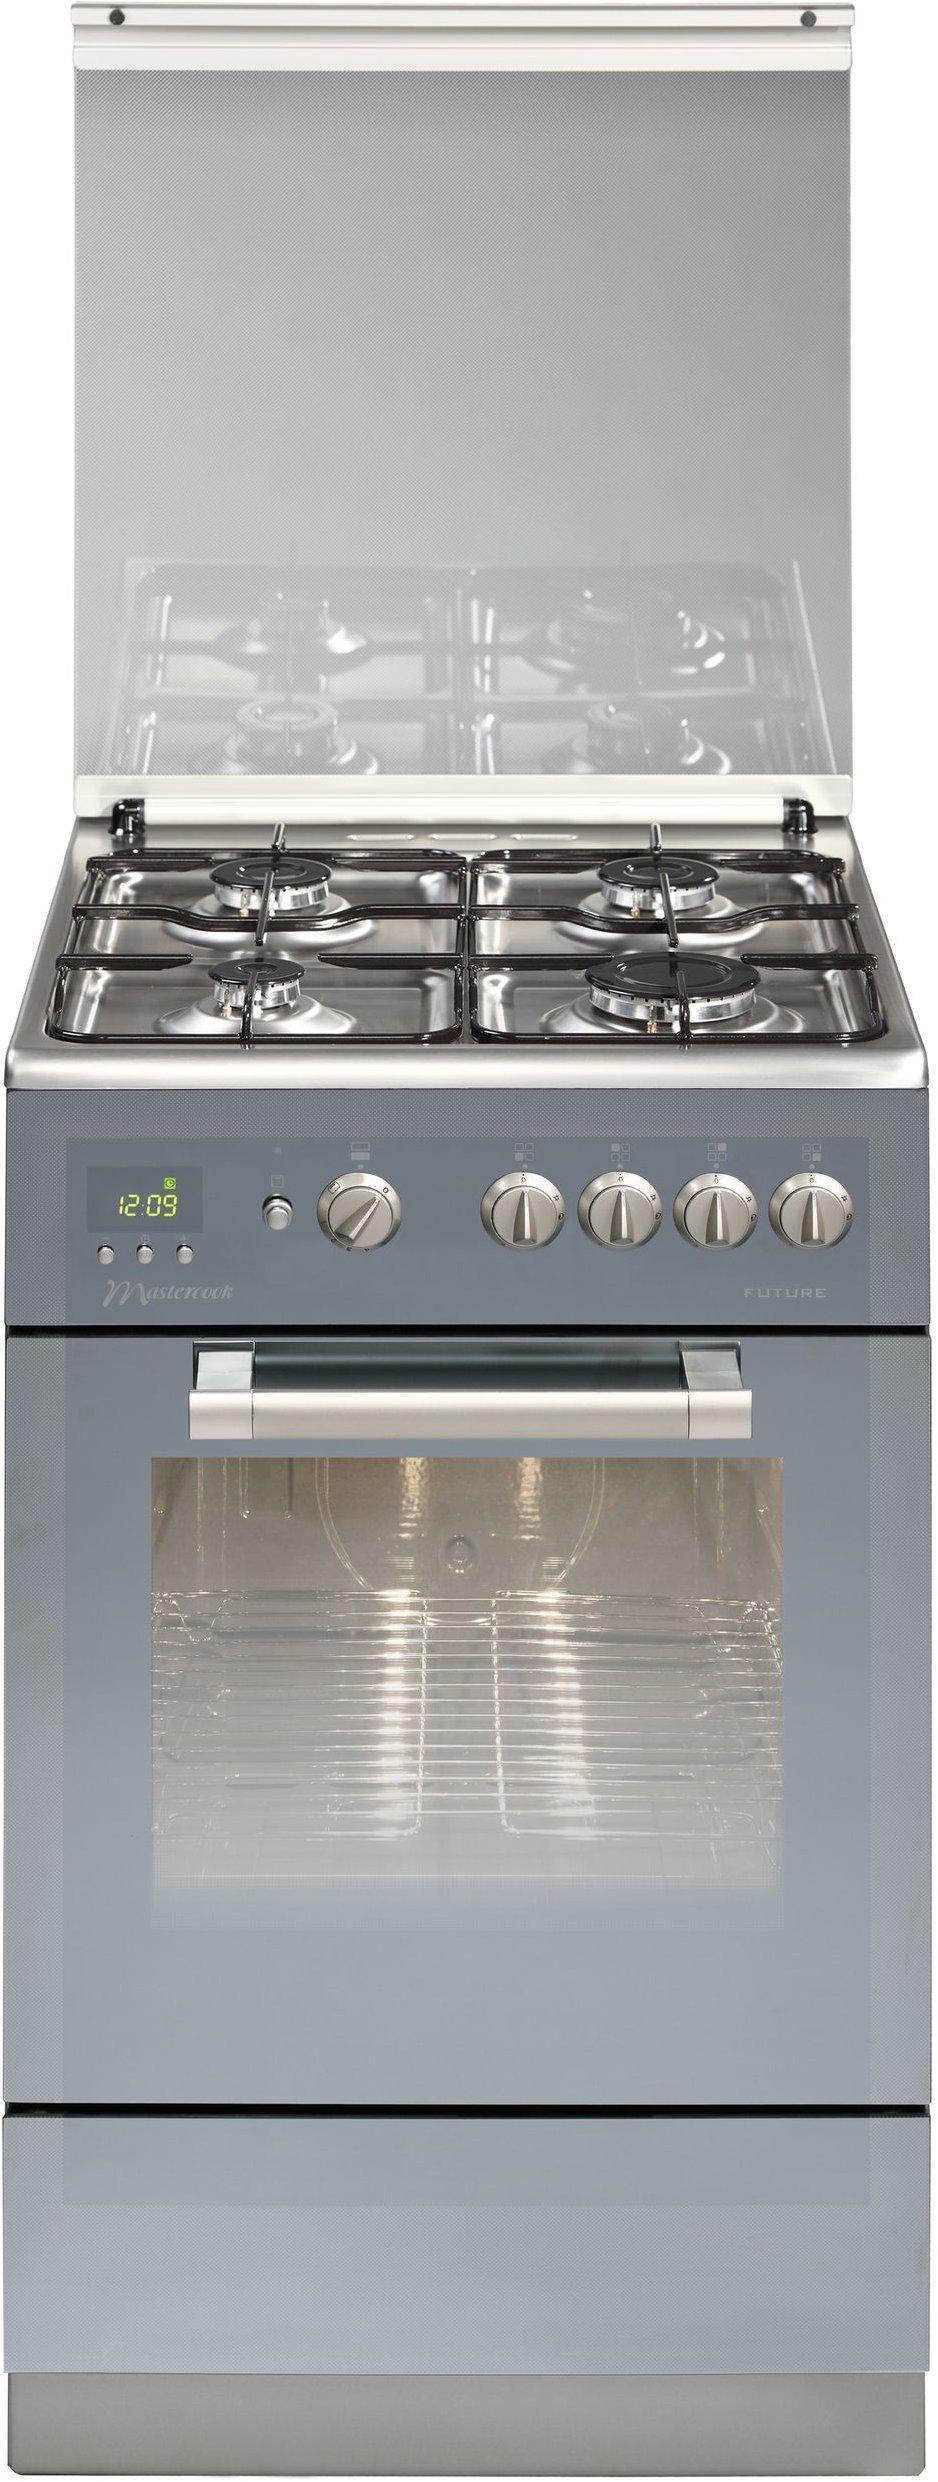 Mastercook KG 1440 LUX Future  Kuchnia gazowa  RTVAGD Sklep Internetowy Mer   -> Kuchnia Gazowa Mastercook Nie Zapala